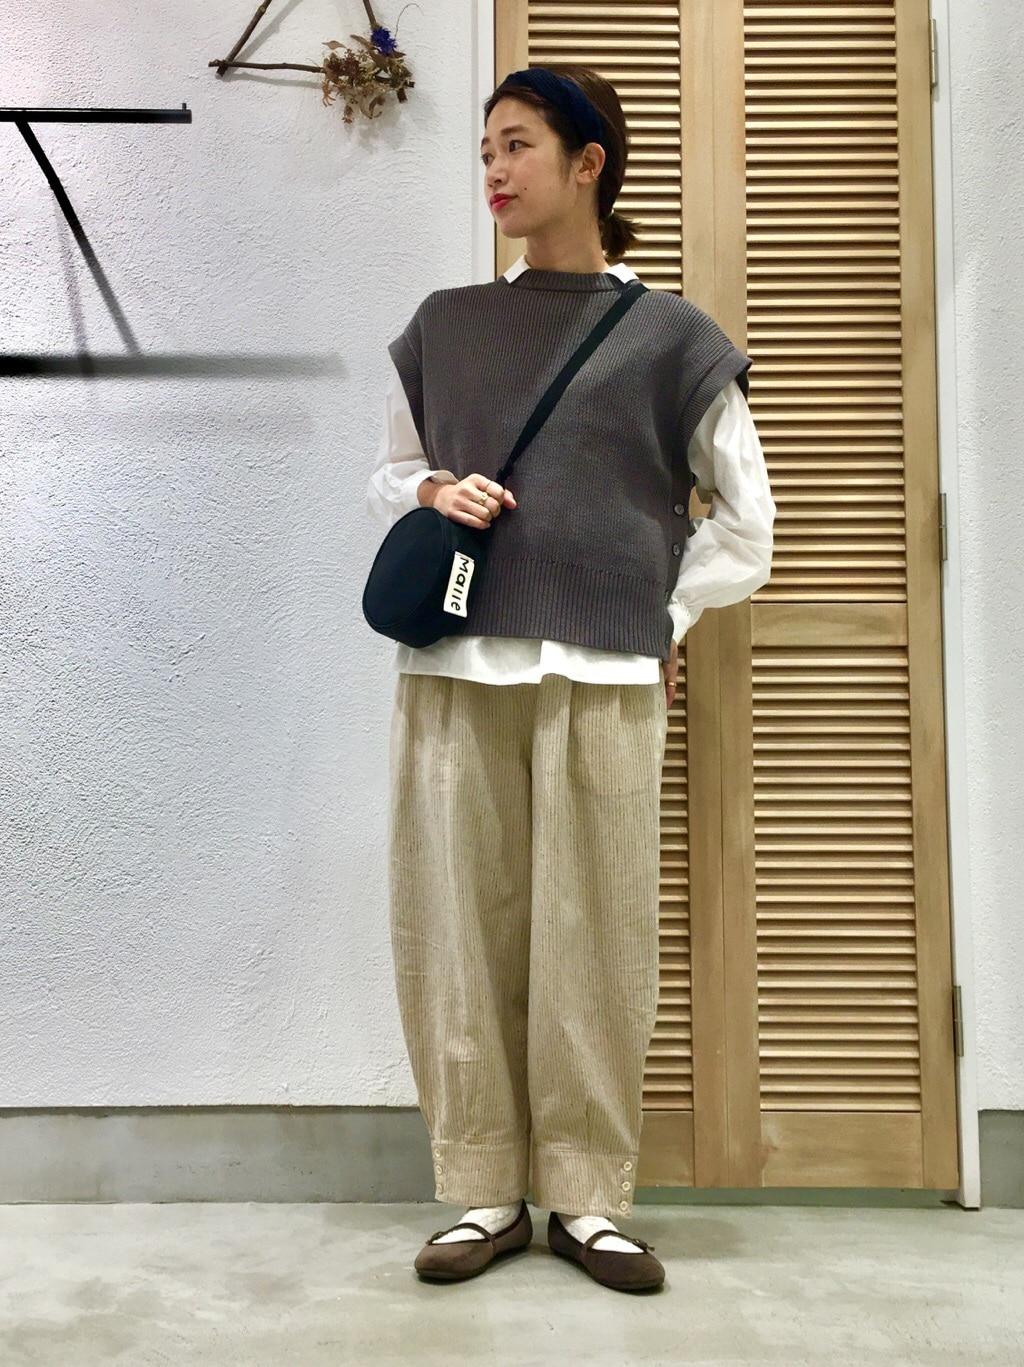 chambre de charme 横浜ジョイナス 身長:160cm 2021.02.14